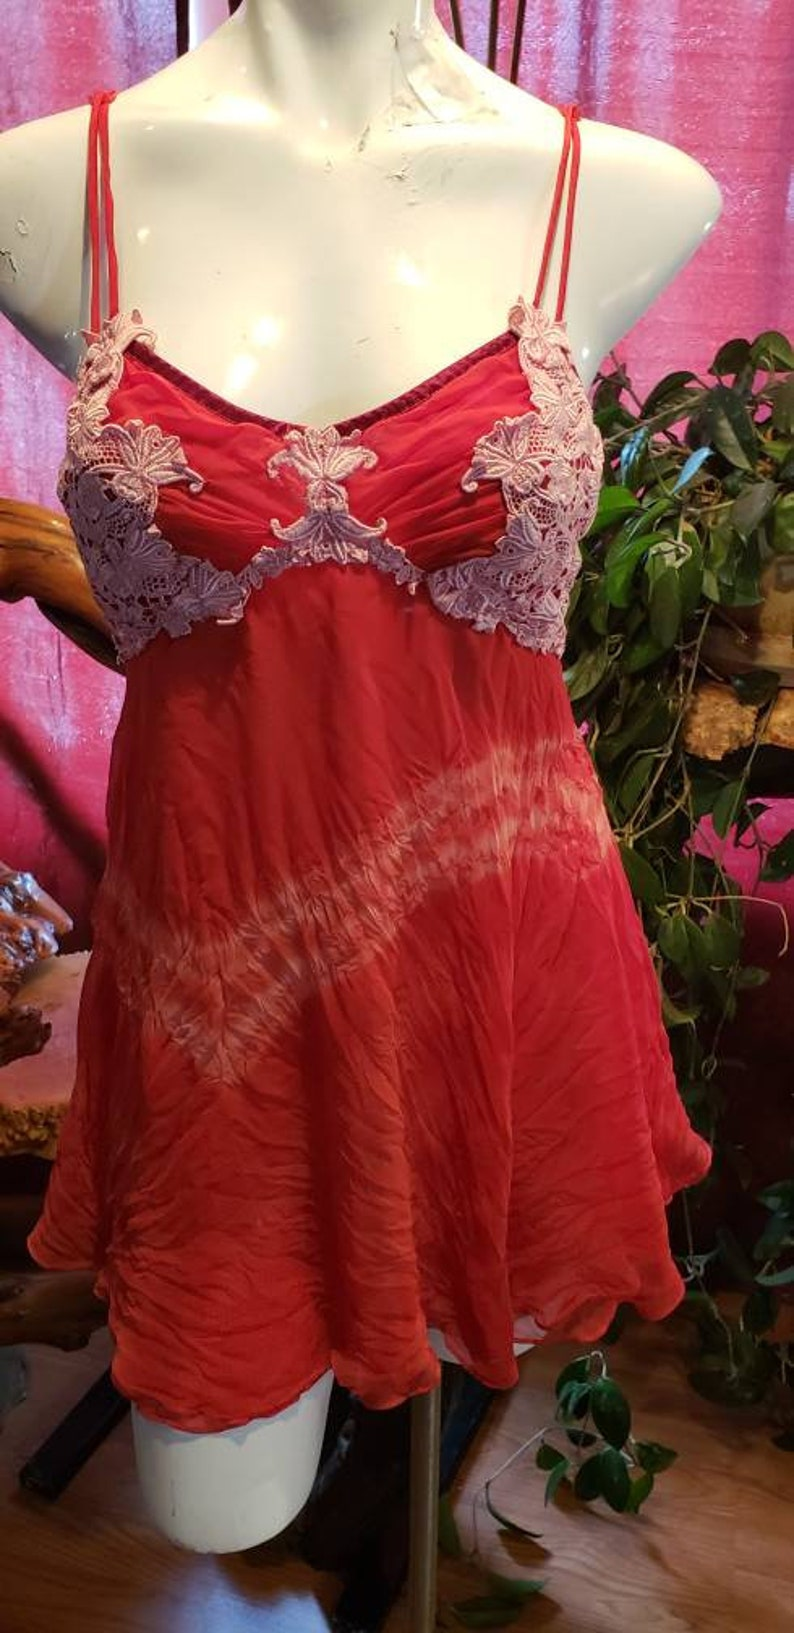 Gift,Bride,Mistress medium,Upcycled,Romantic,Tiedye,Sensual,Valentine/'s Poledance,Sleepwear,Loungewear,Lace,Straps--OCTOBER Remade